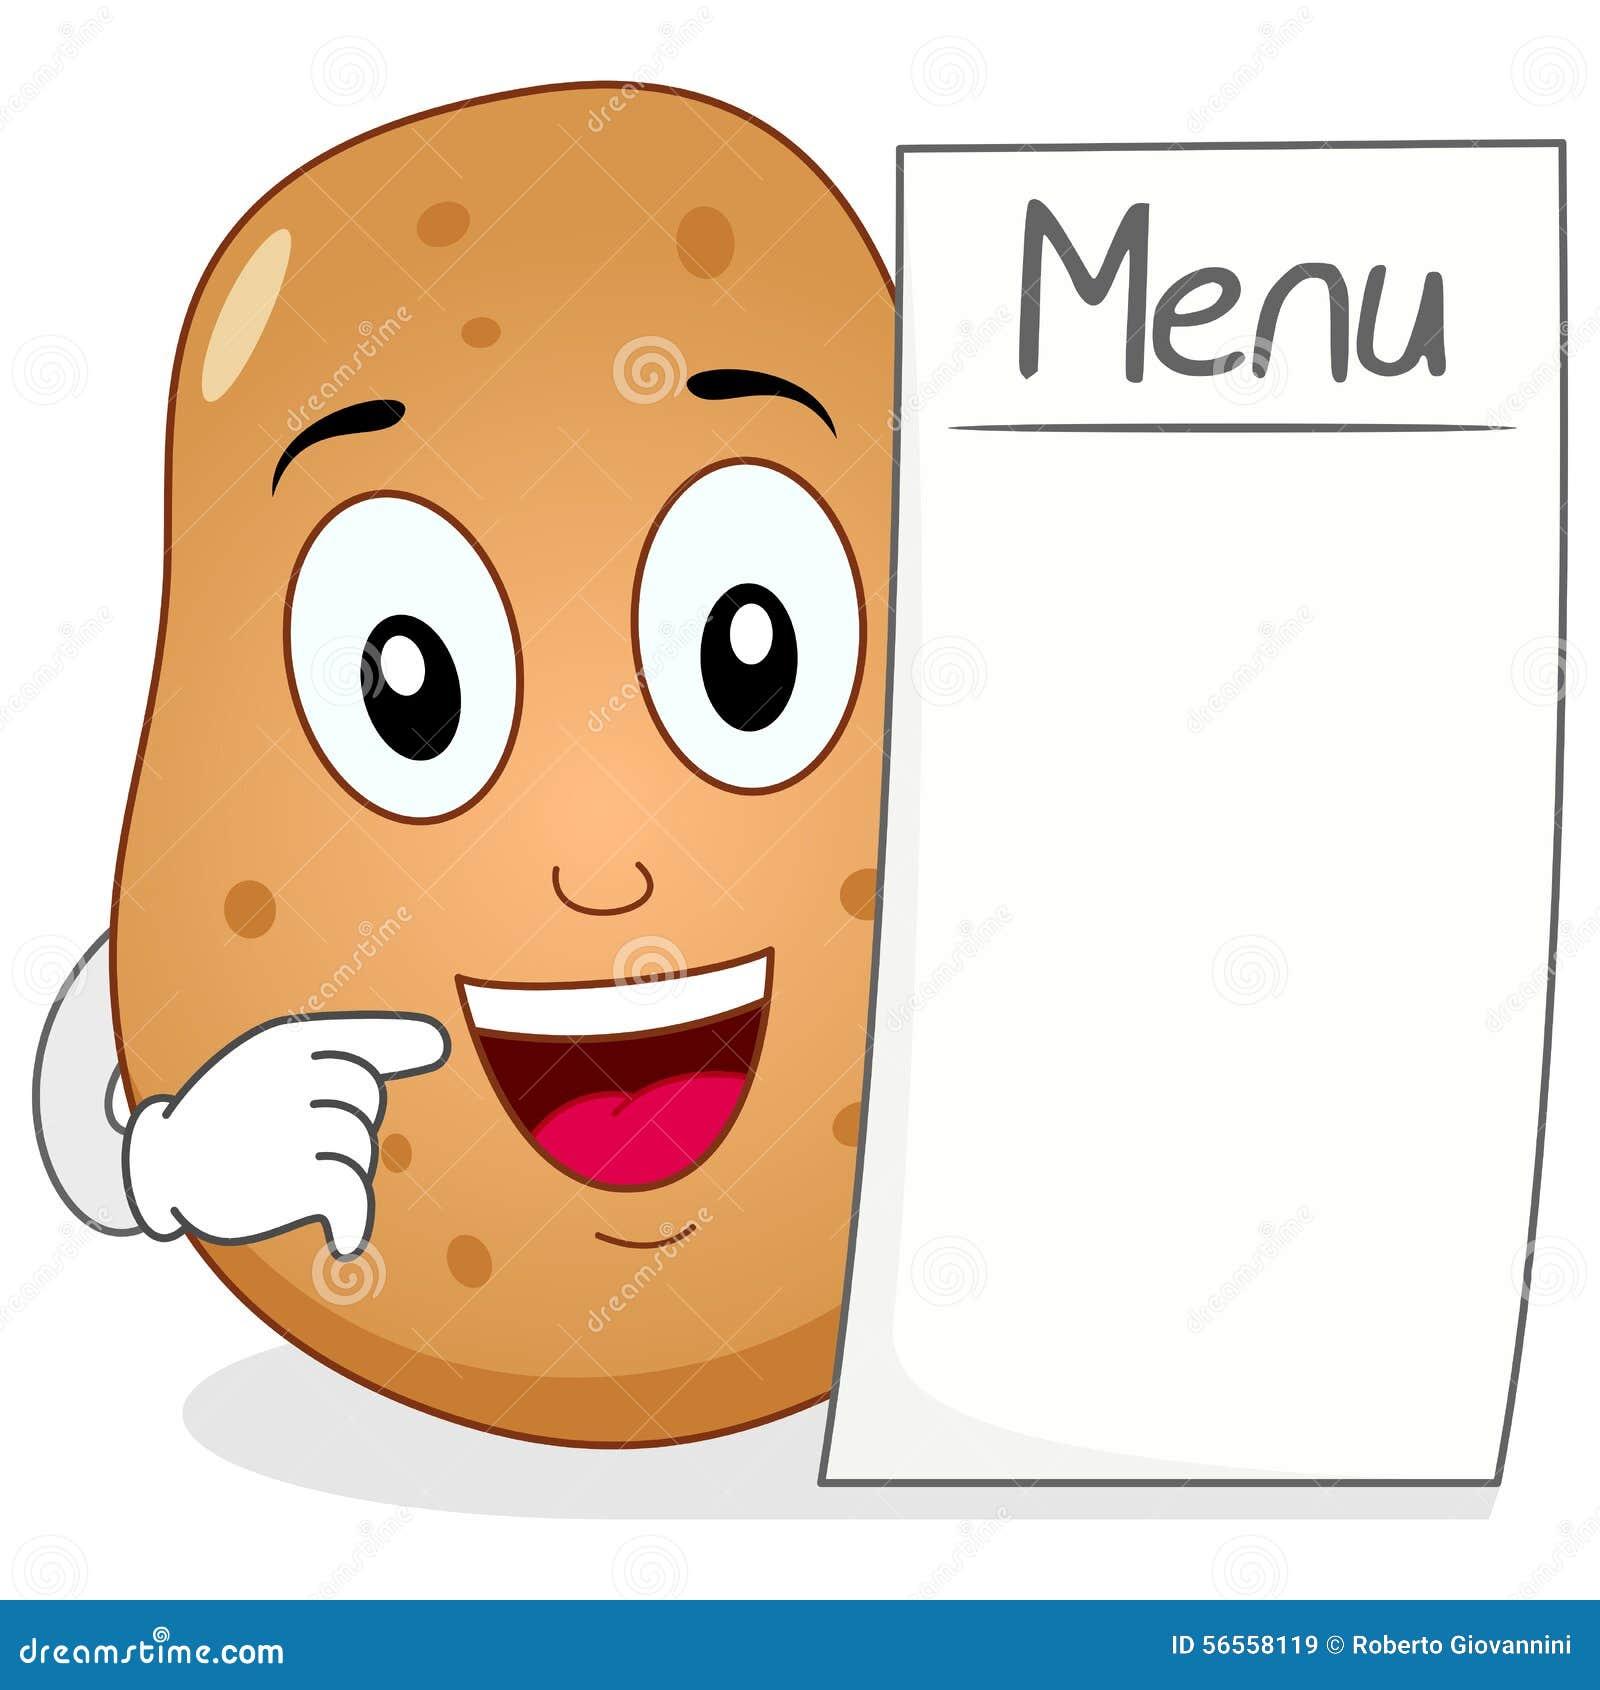 Cute Potato